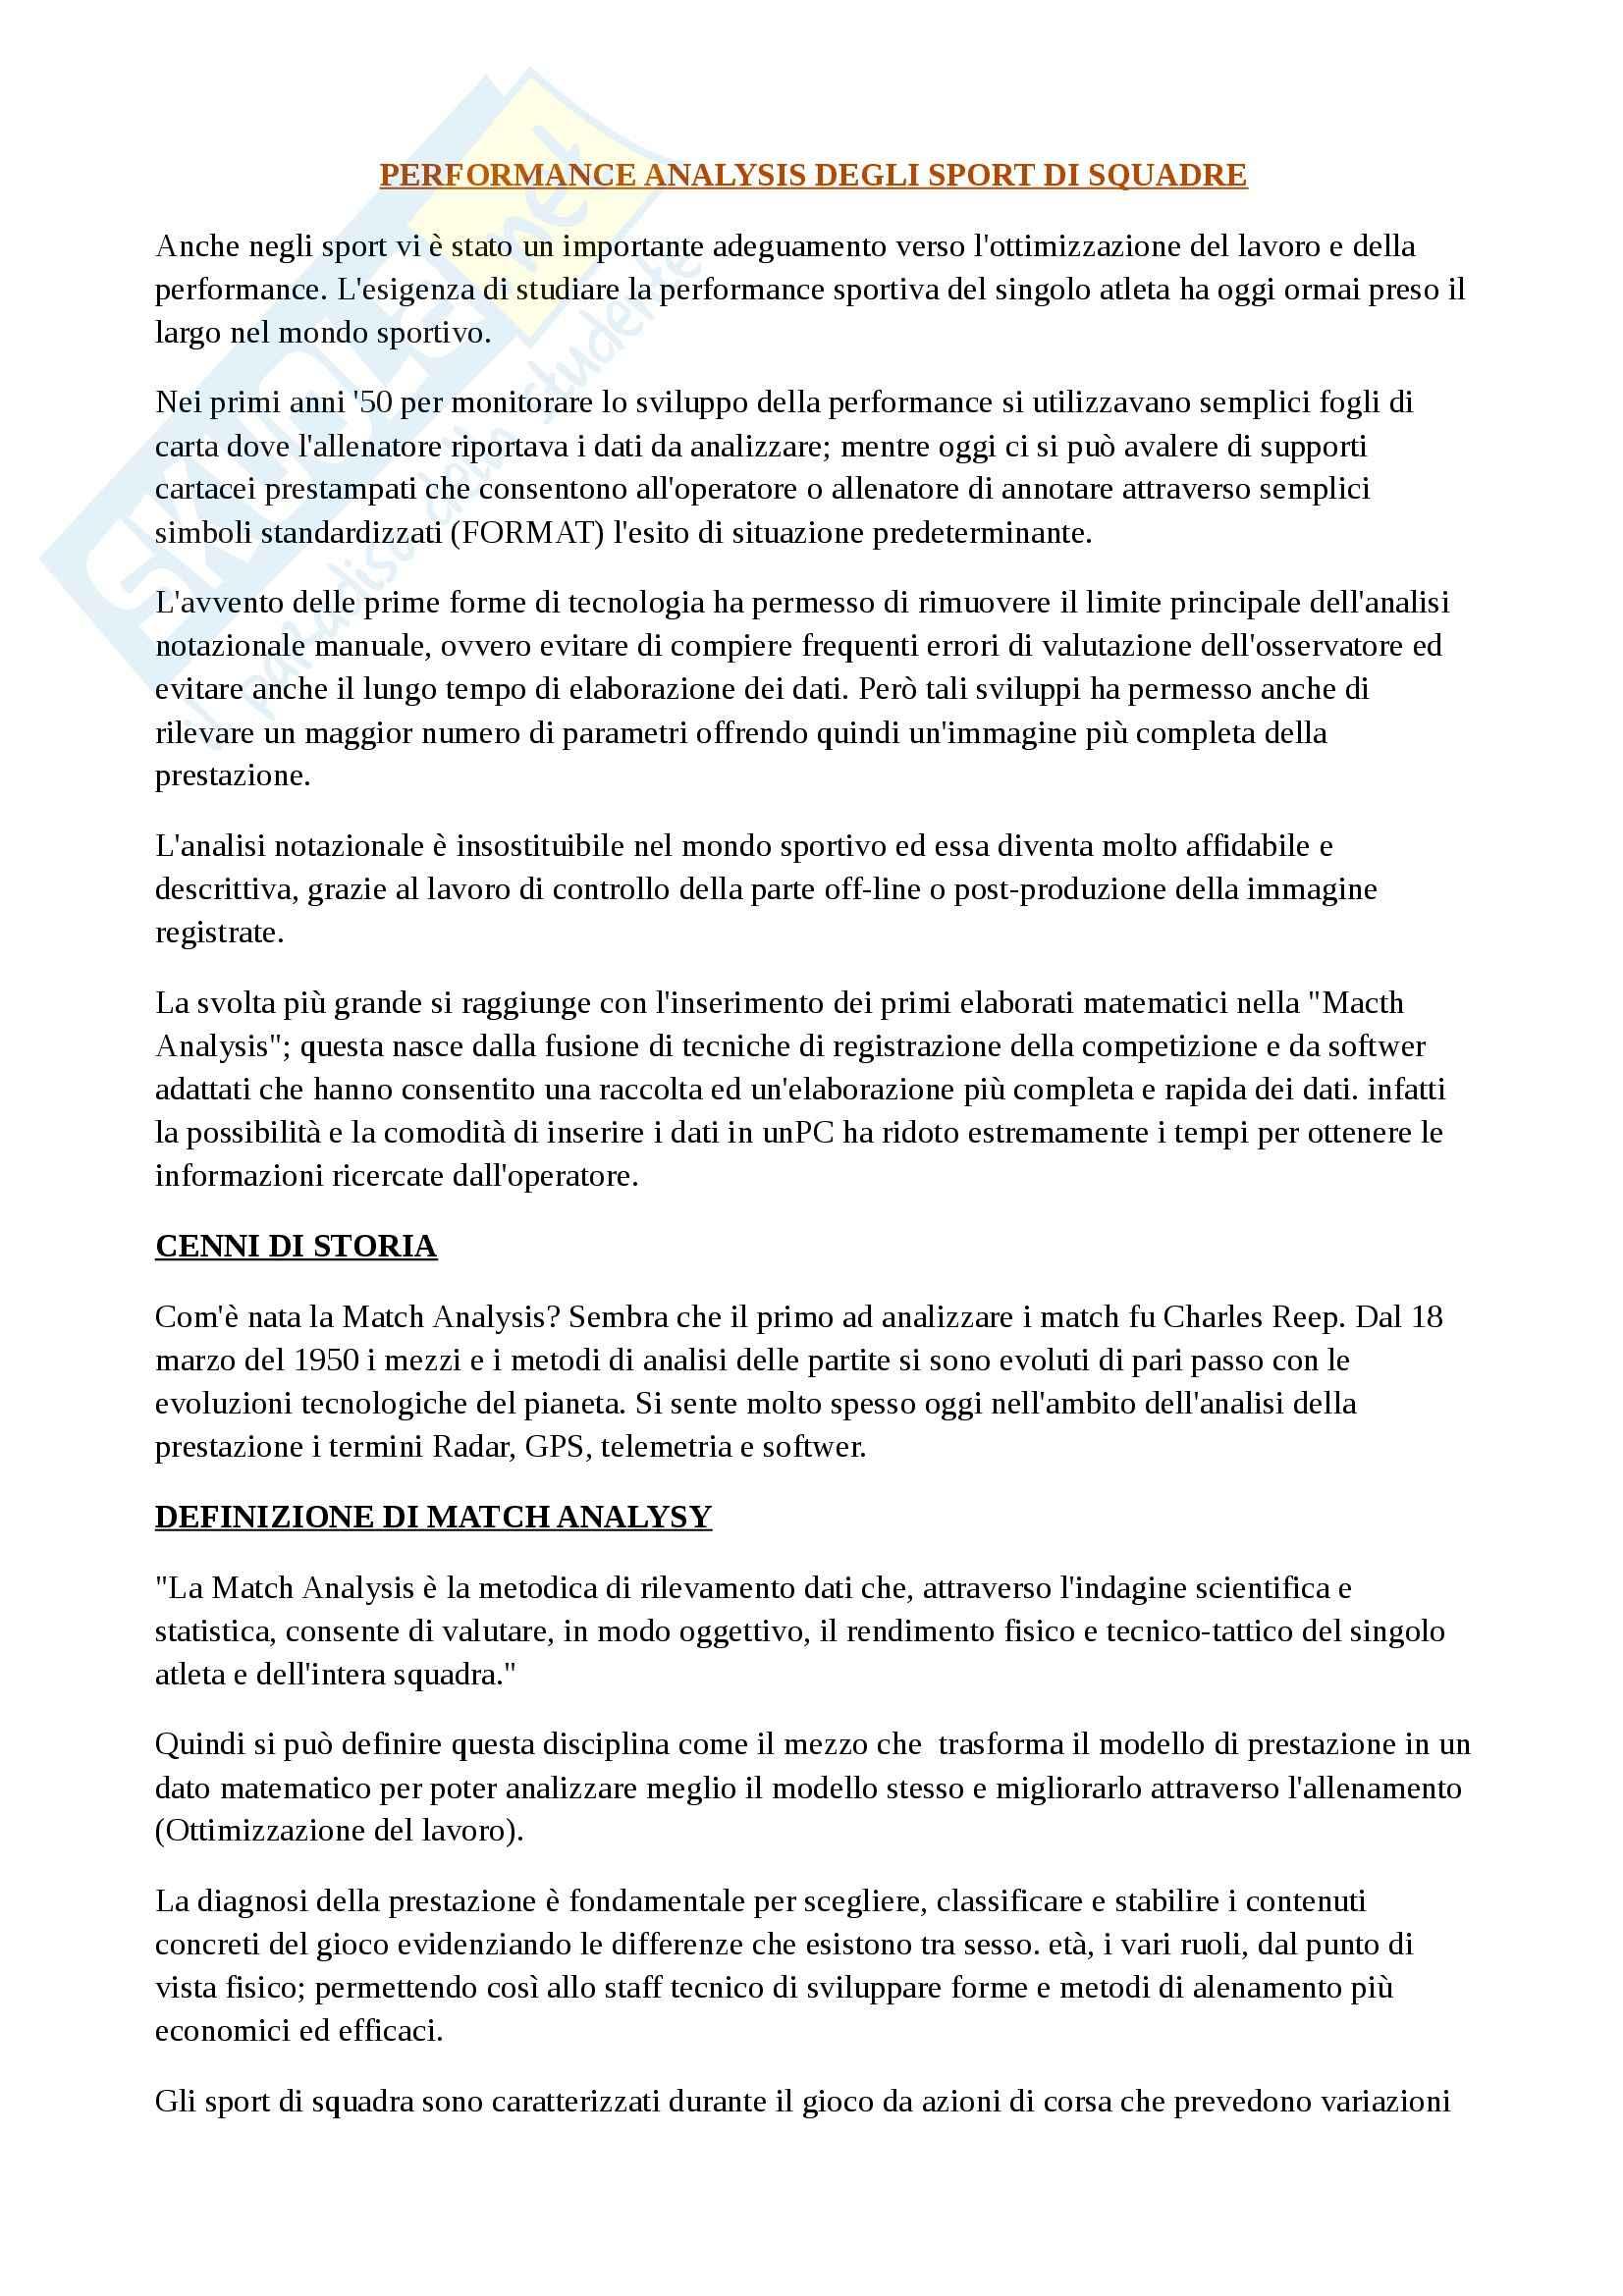 Analisi Della Performance Sportiva - Match analysis